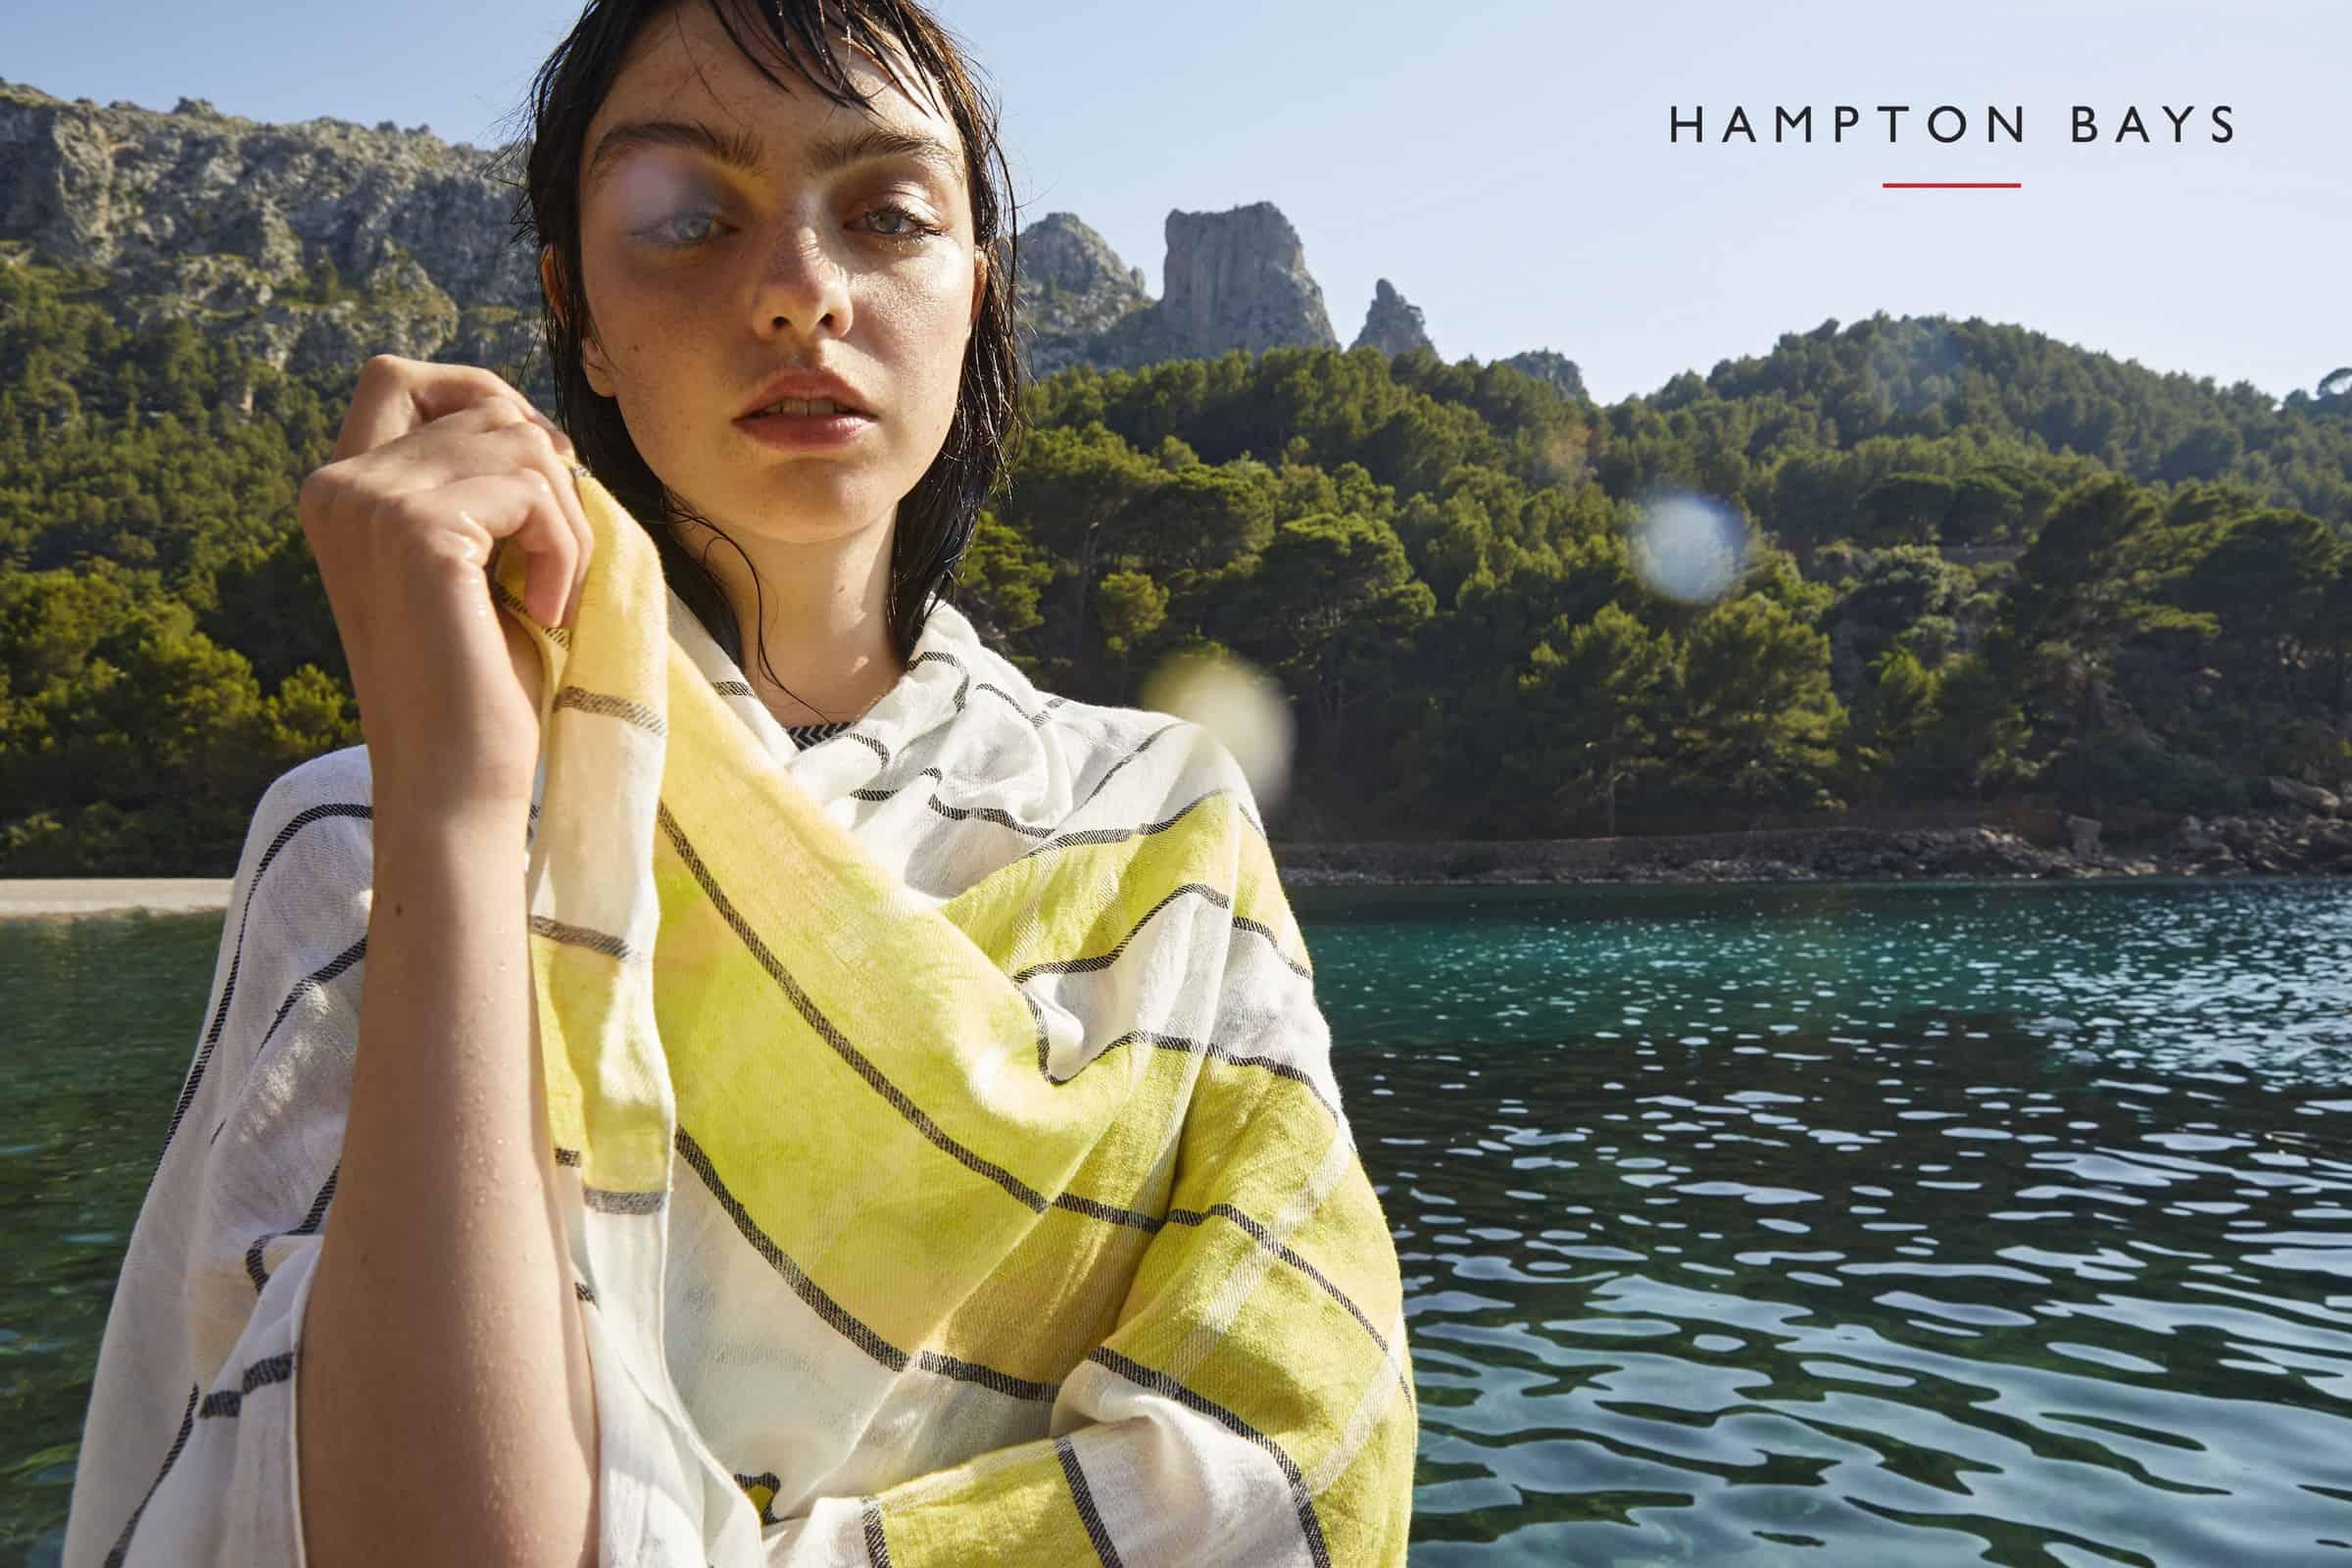 HAMPTON BAYS ZOMER 2019 NR13